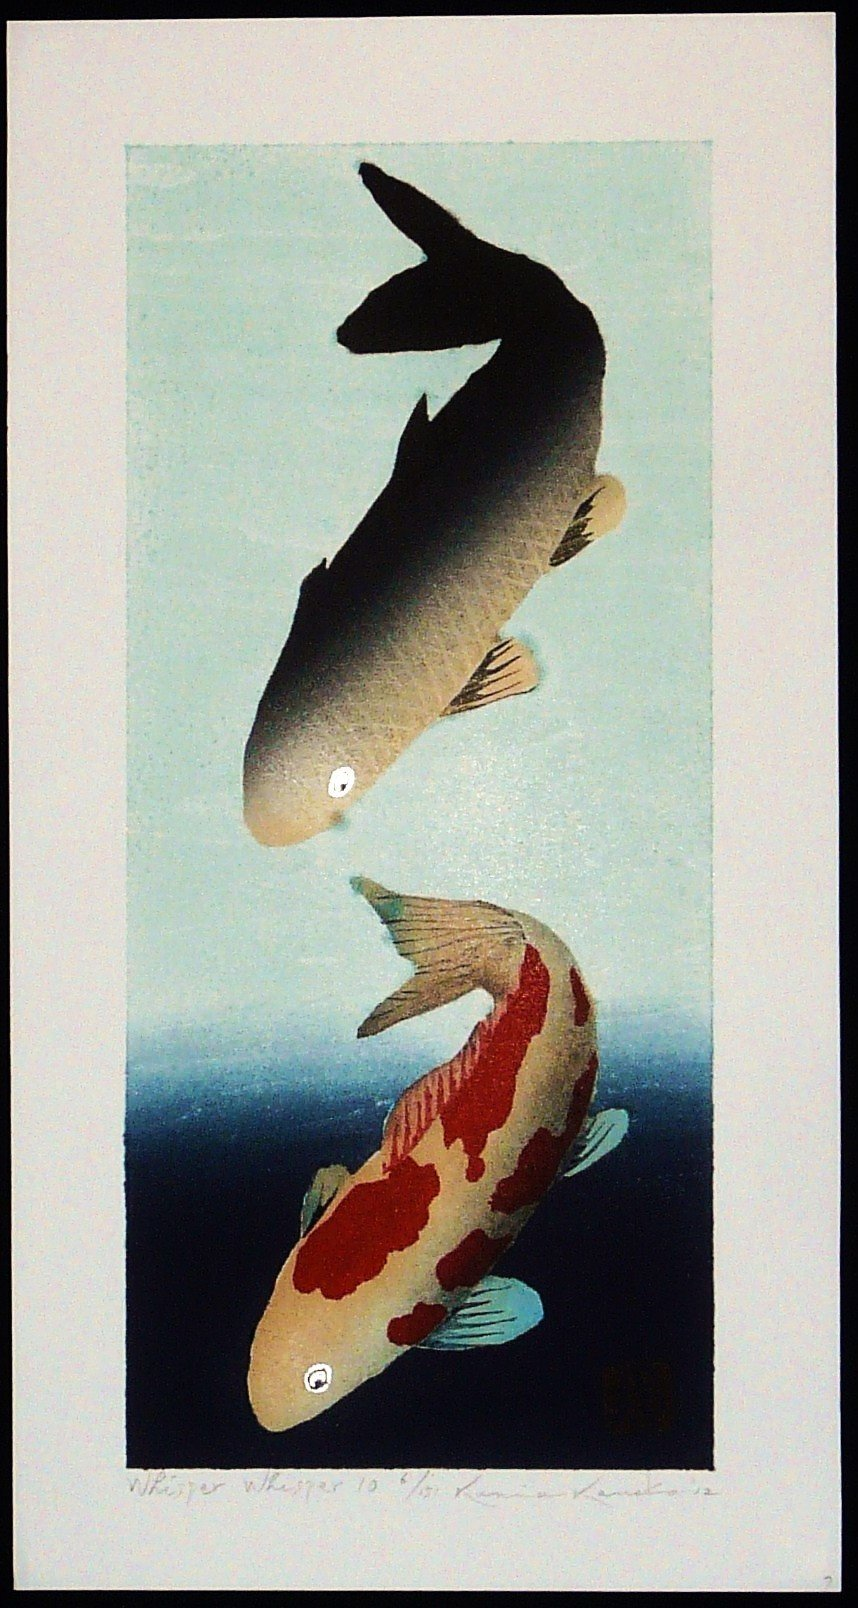 Kunio Kaneko: #P3927 WHISPER WHISPER 10